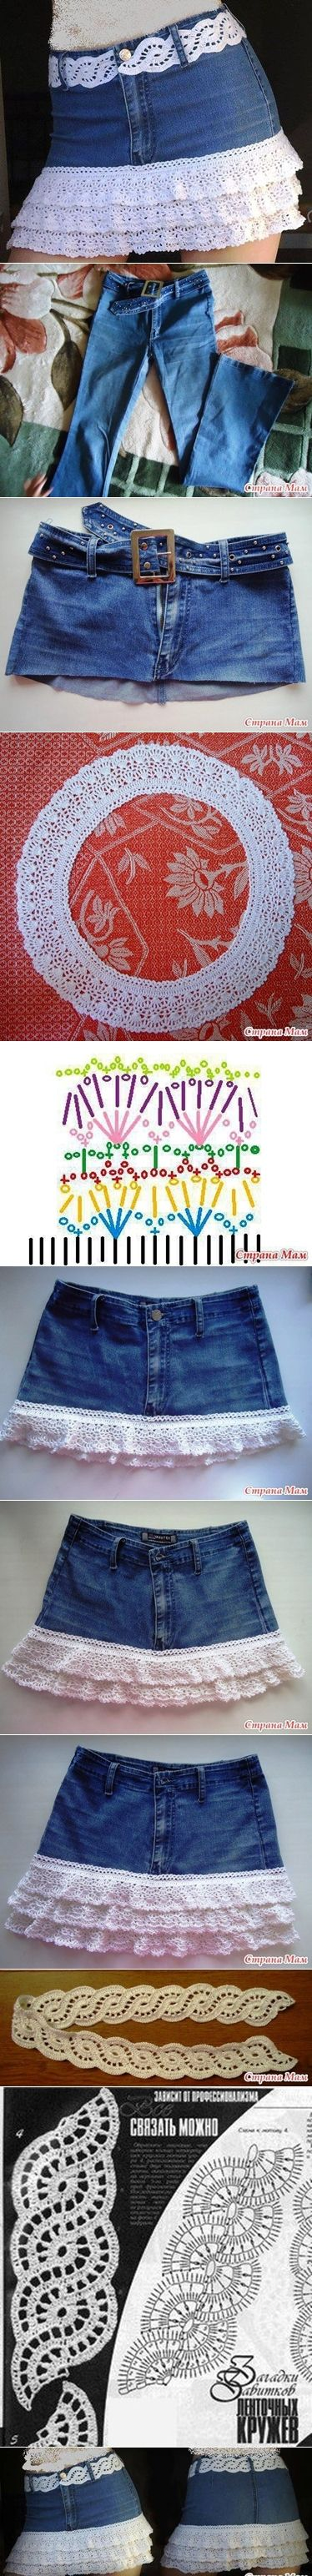 DIY Crochet layered Skirt from Old Jean | www.FabArtDIY.com LIKE Us on Facebook ==> https://www.facebook.com/FabArtDIY